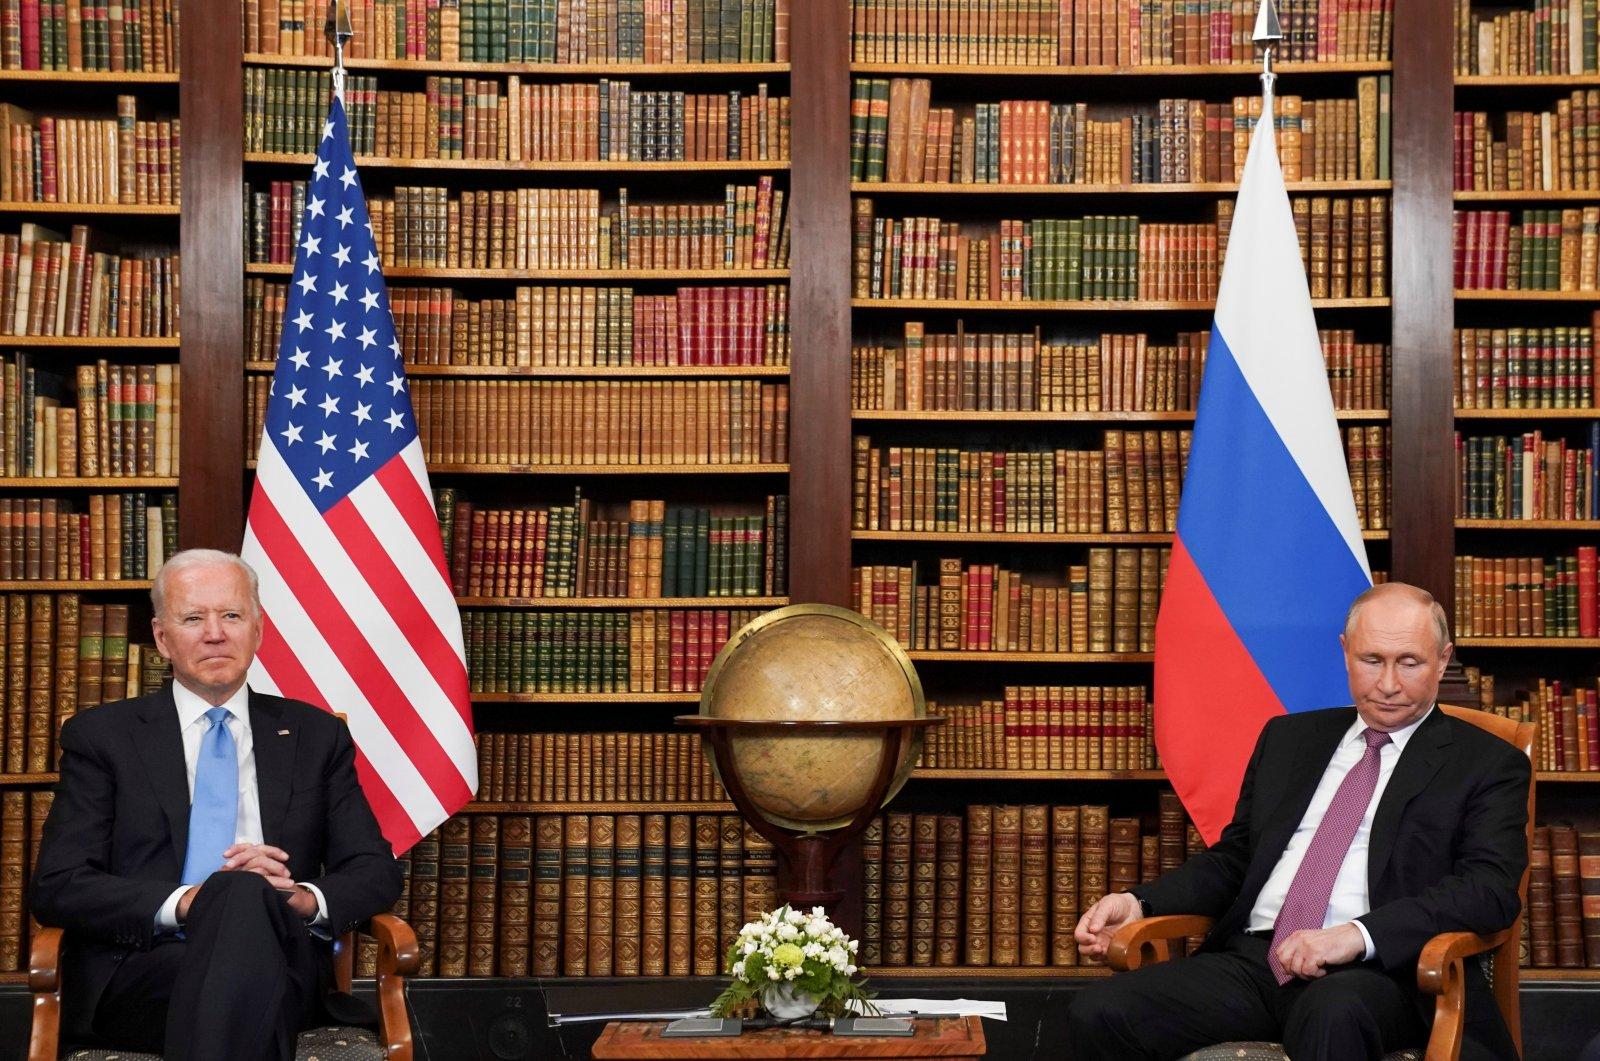 U.S. President Joe Biden and Russia's President Vladimir Putin meet for the U.S.-Russia summit at Villa La Grange in Geneva, Switzerland, June 16, 2021. (Reuters Photo)